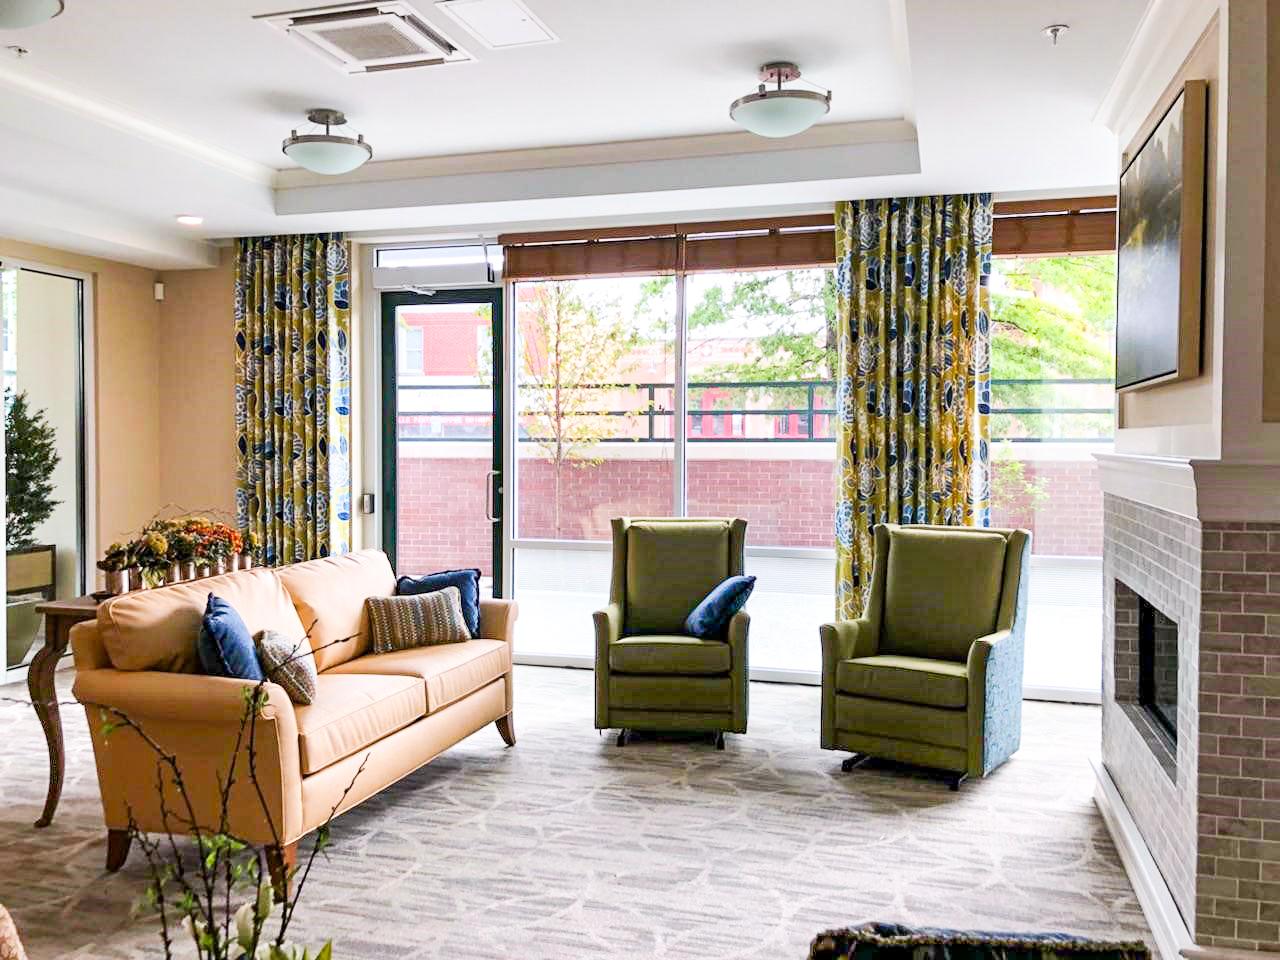 Washington DC Senior Living facility lounge fireside area